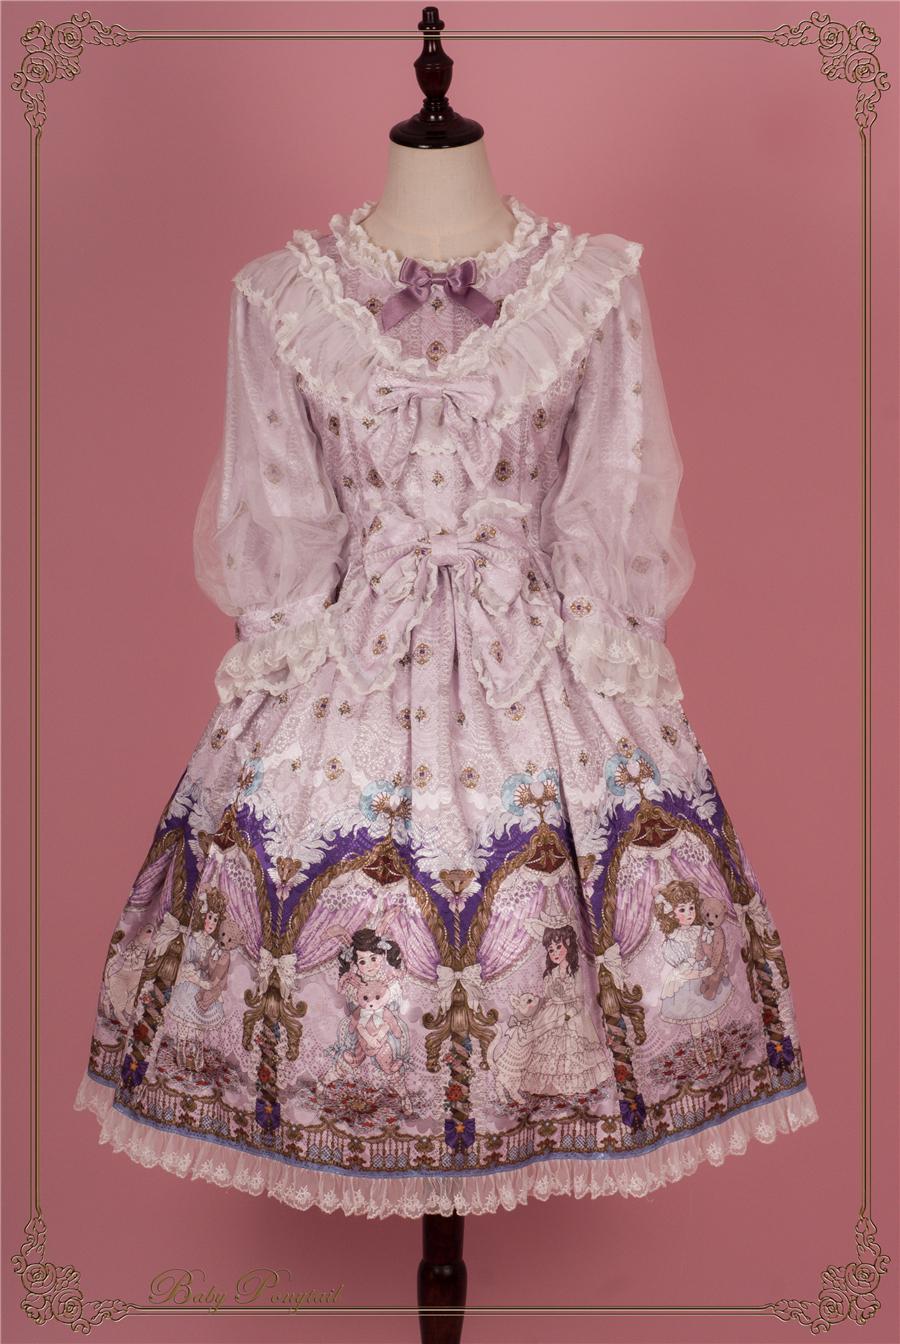 BabyPonytail_Stock Photo_My Favorite Companion_OP Lavender_01.jpg